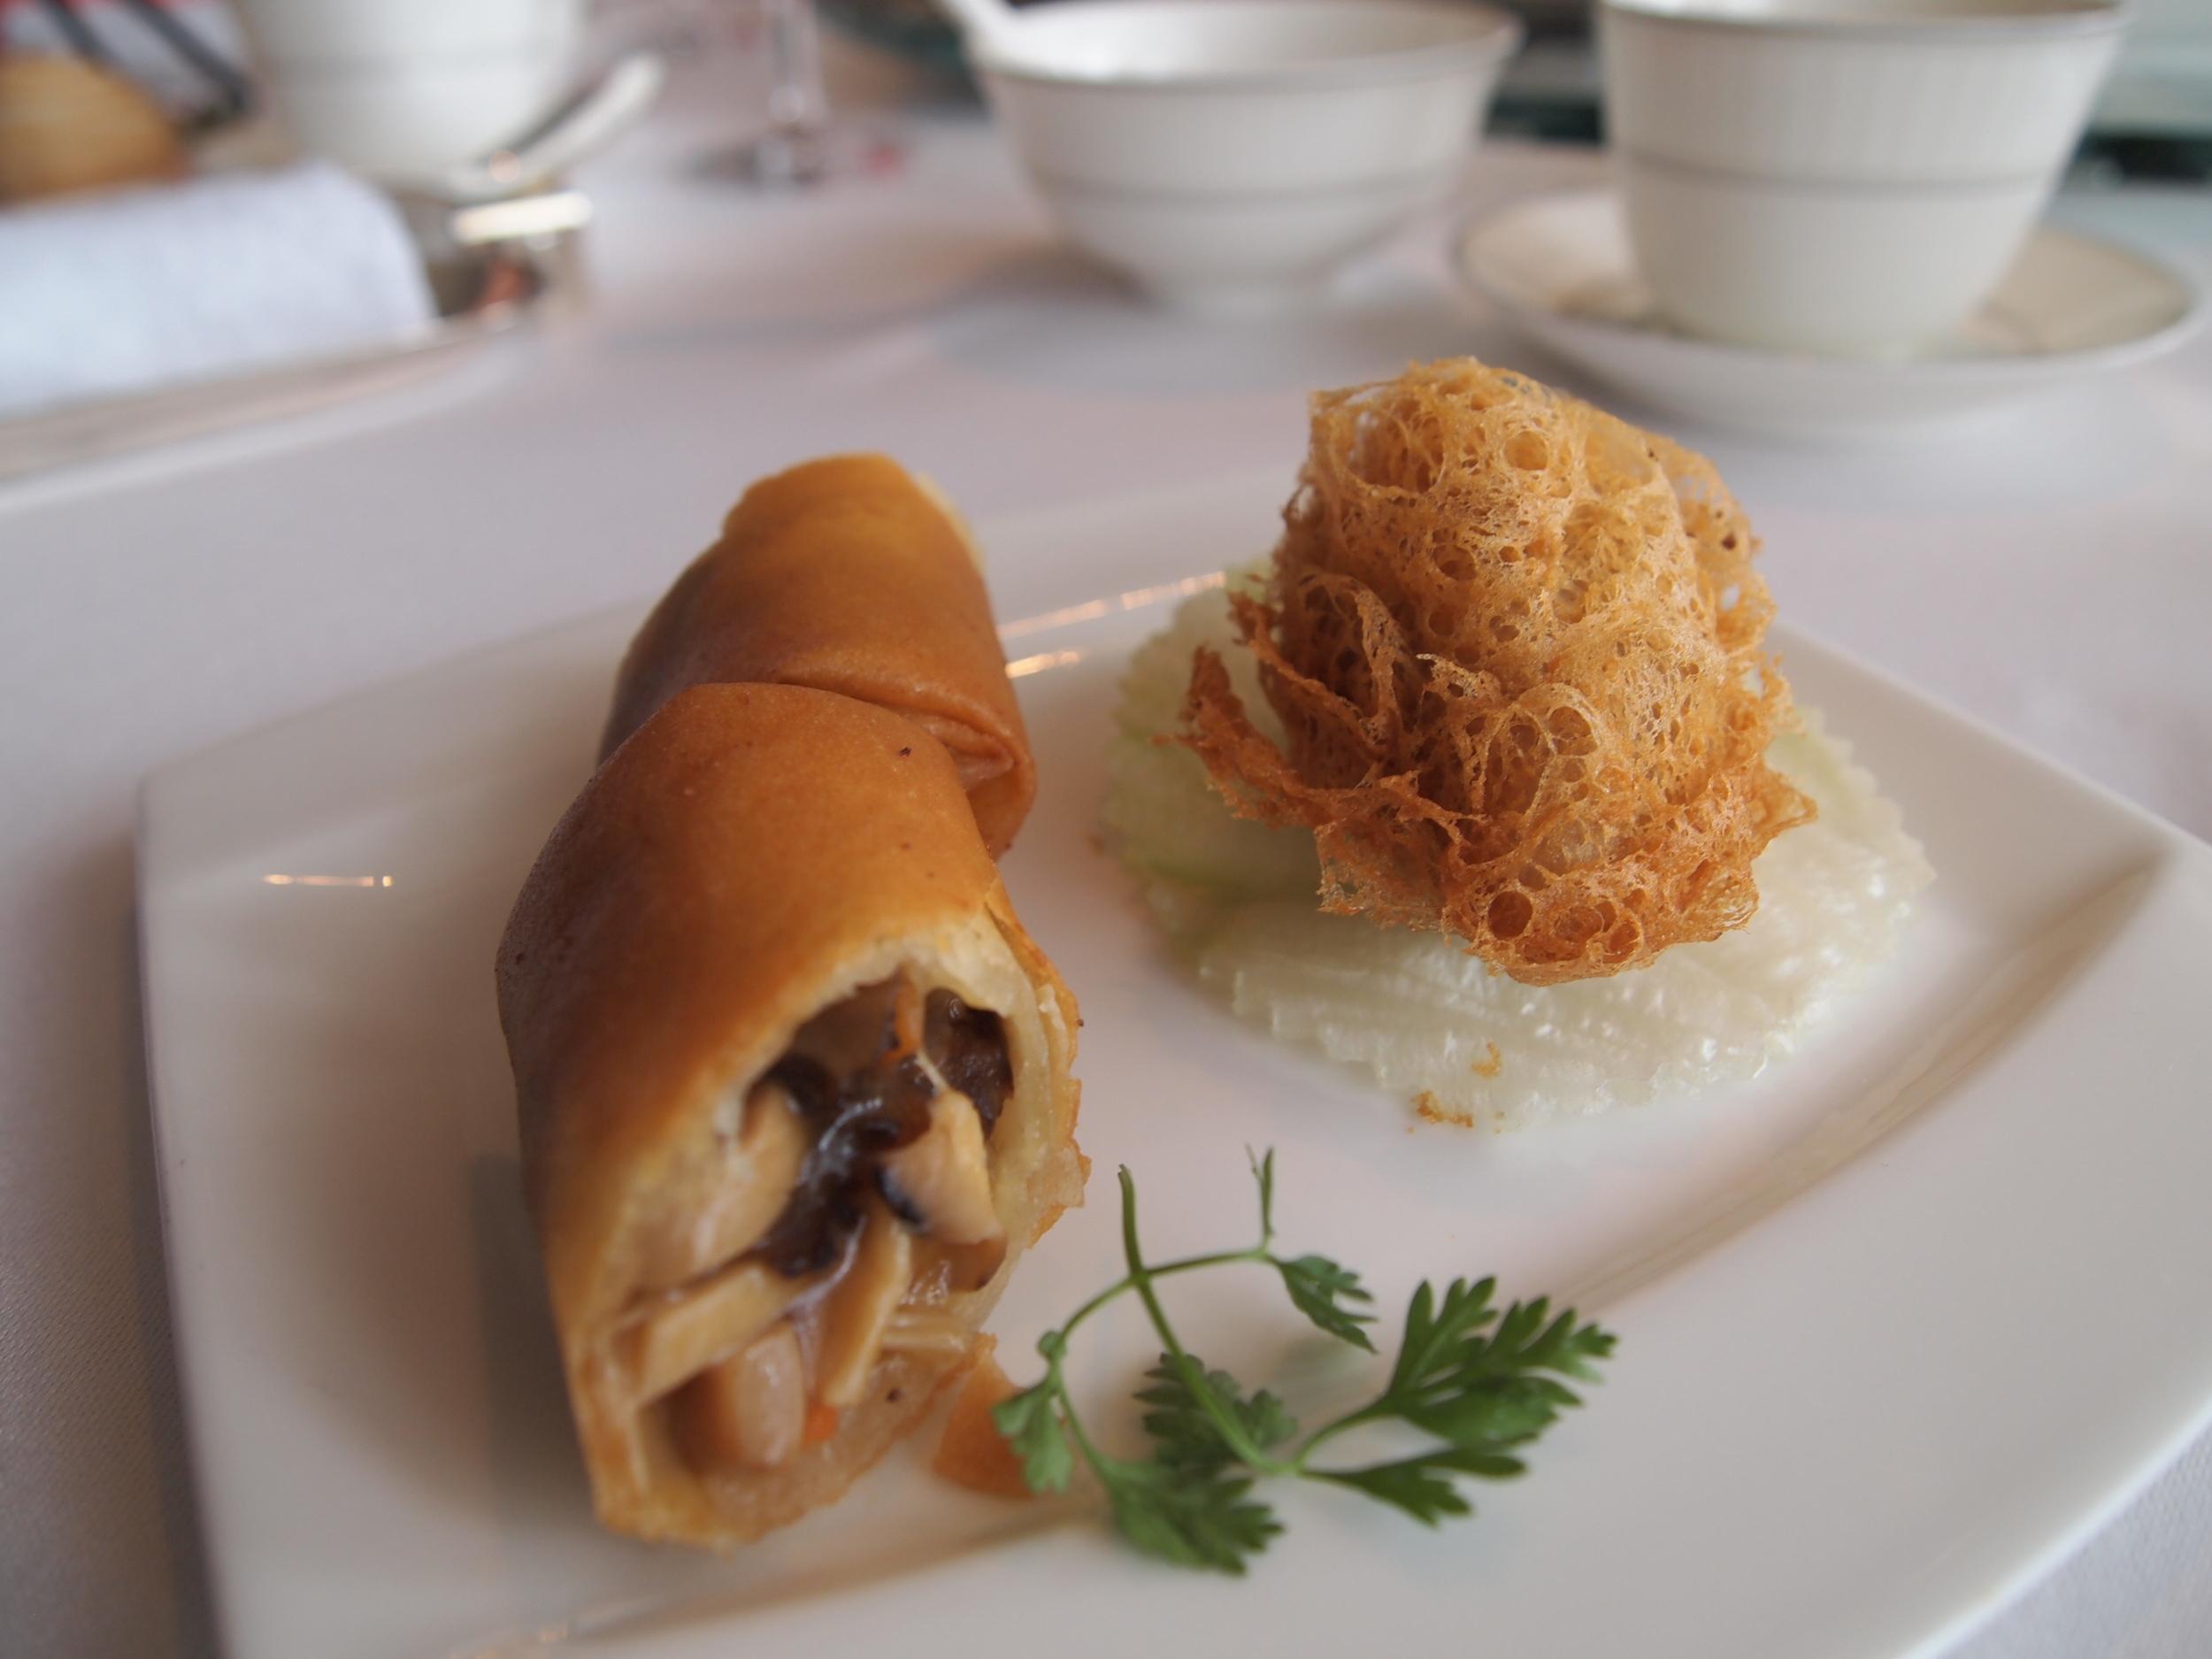 Dim sum in Lung King Heen, the world's first three Michelin star restaurant